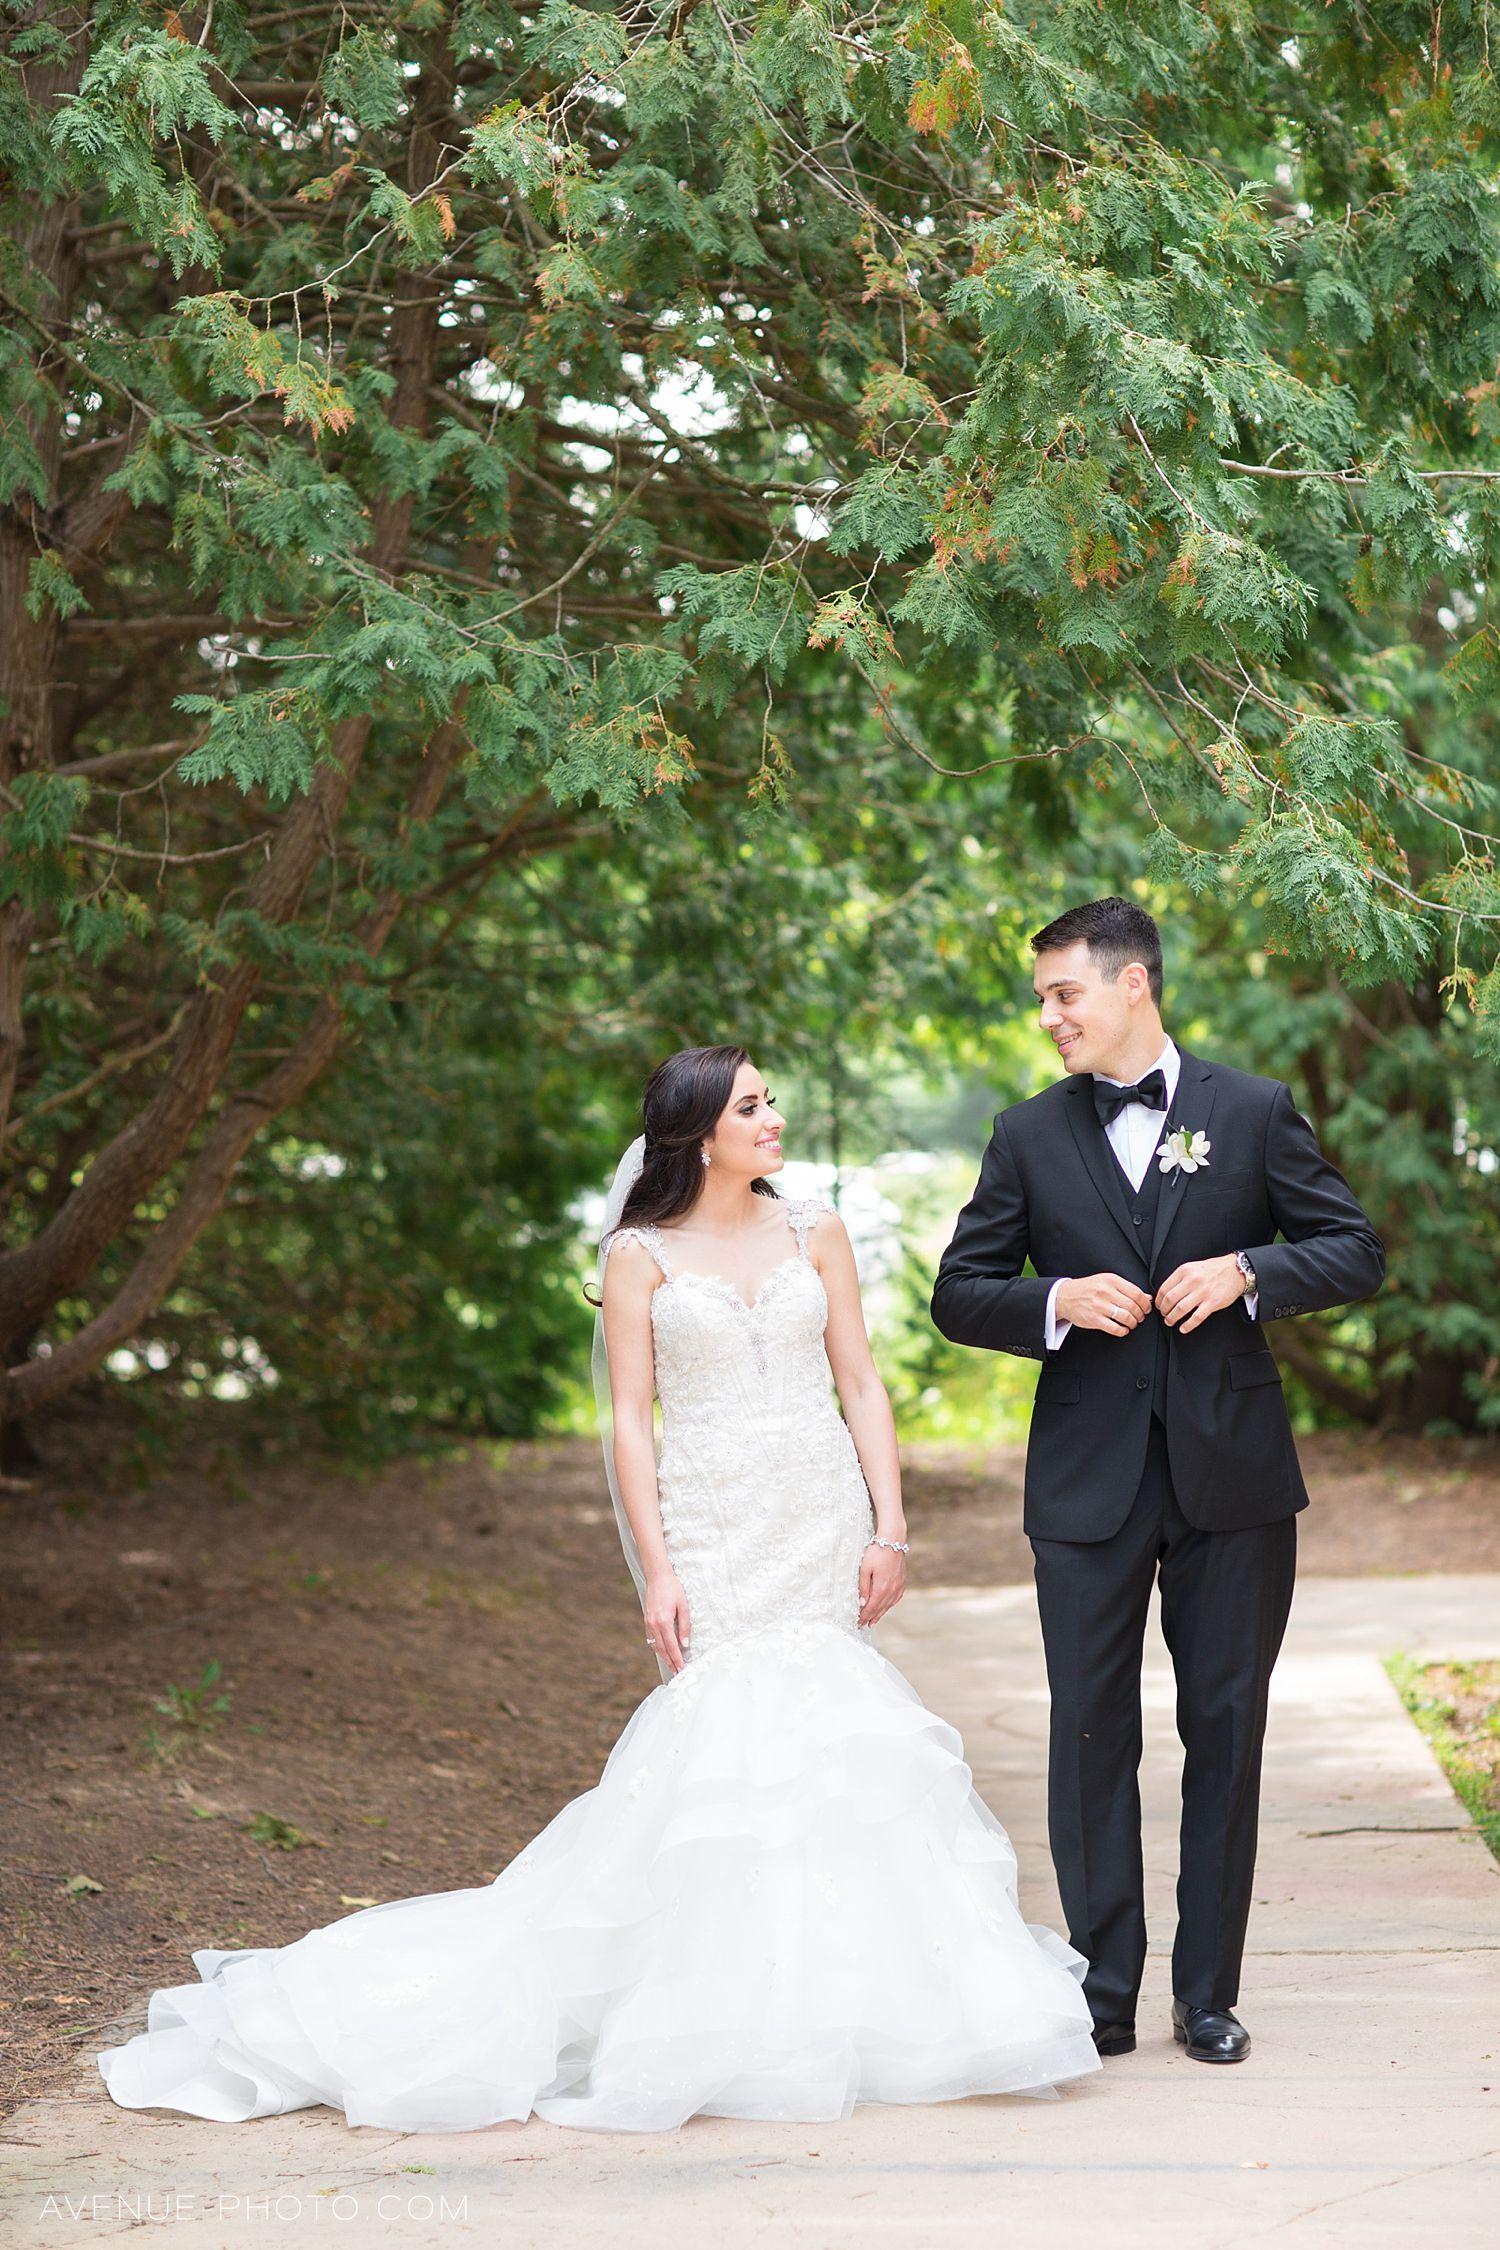 hazelton manor wedding,toronto wedding photography,greek wedding photos,kleinburg wedding,mcmichael gallery wedding, greek wedding ,hazelton manor,indoor photography locations in toronto,vaughan wedding photography,weddings